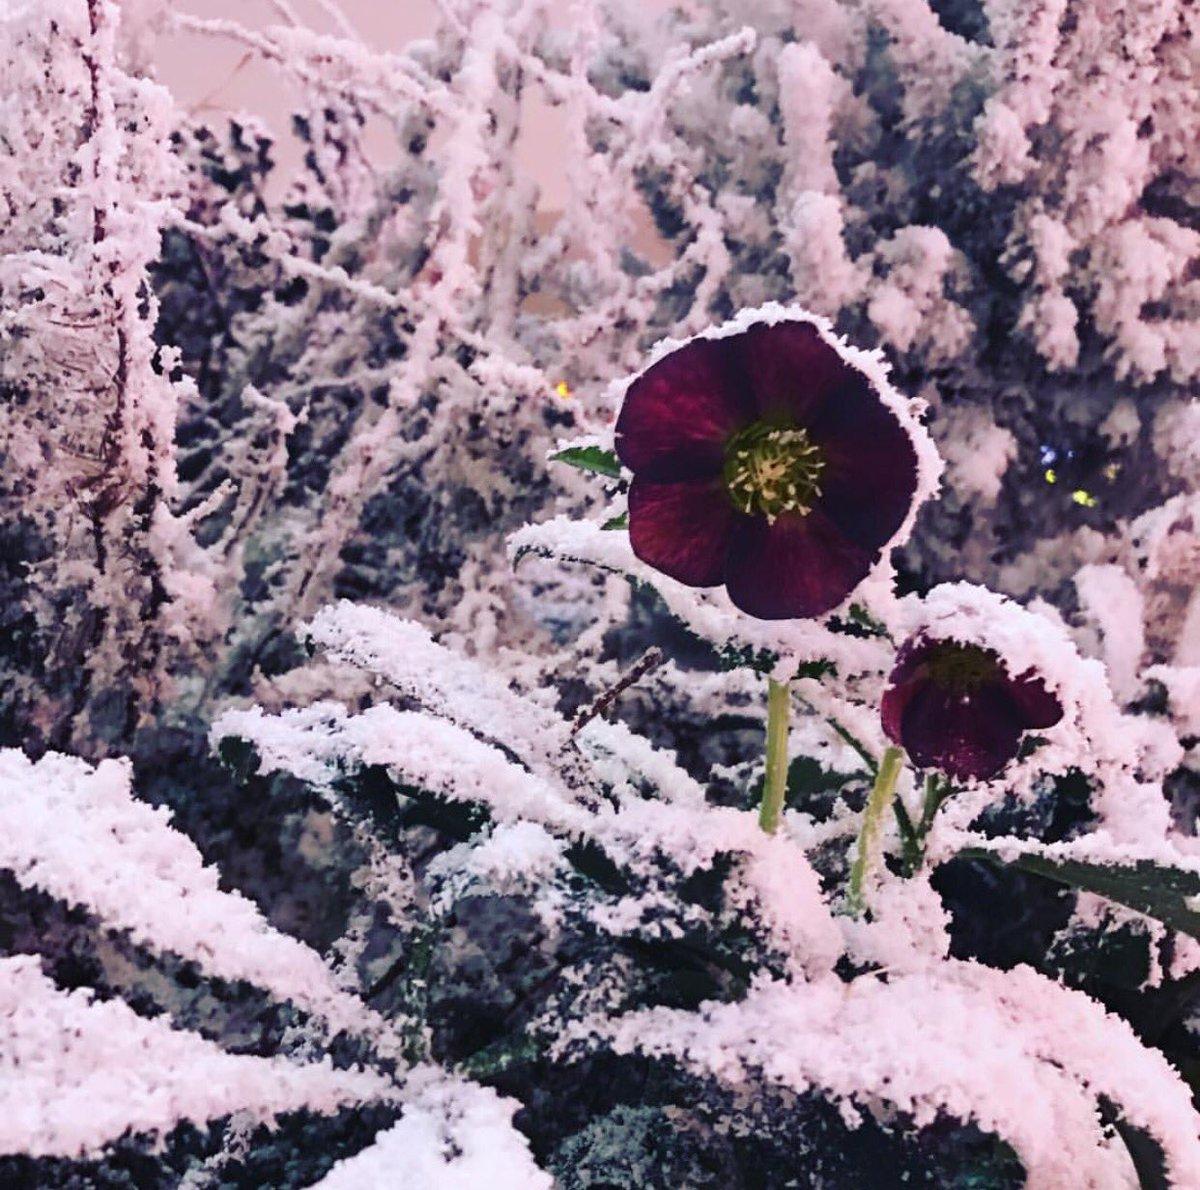 For it was #TheNightBeforeChristmas... @Carlyandflowers #EastBar #sketchlondon #outsideinside #letitsnow https://t.co/YBqdbqbFXs